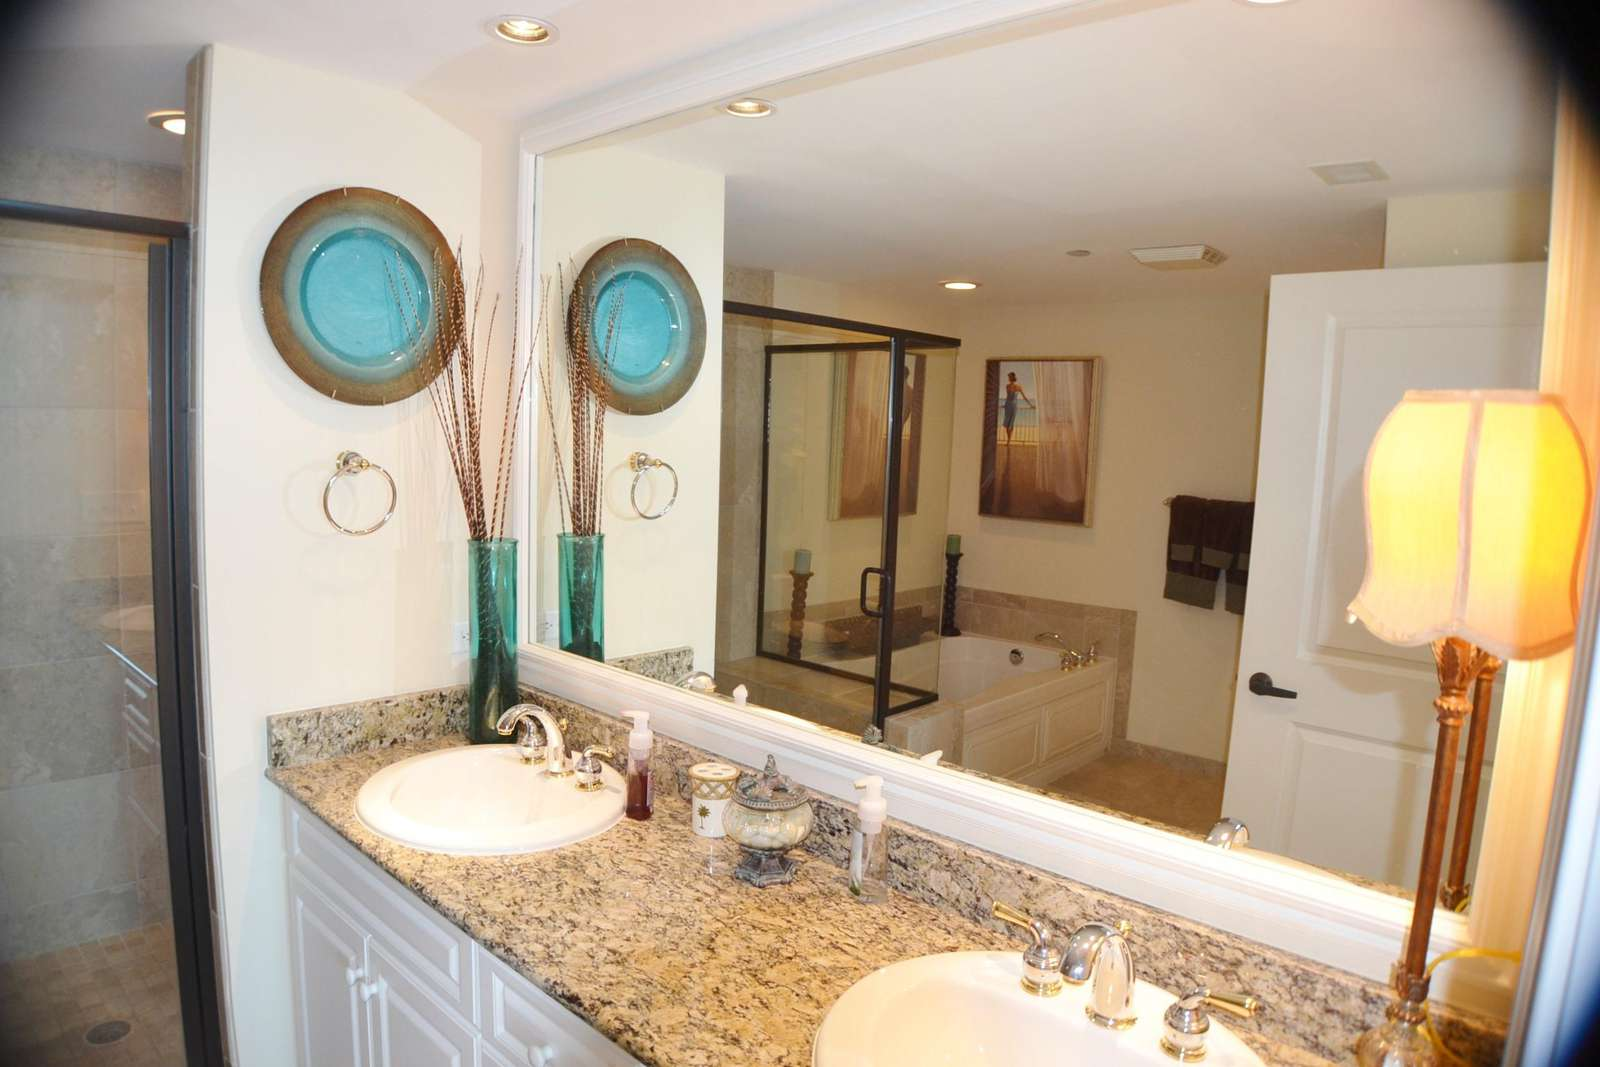 Double sinks, granite tops